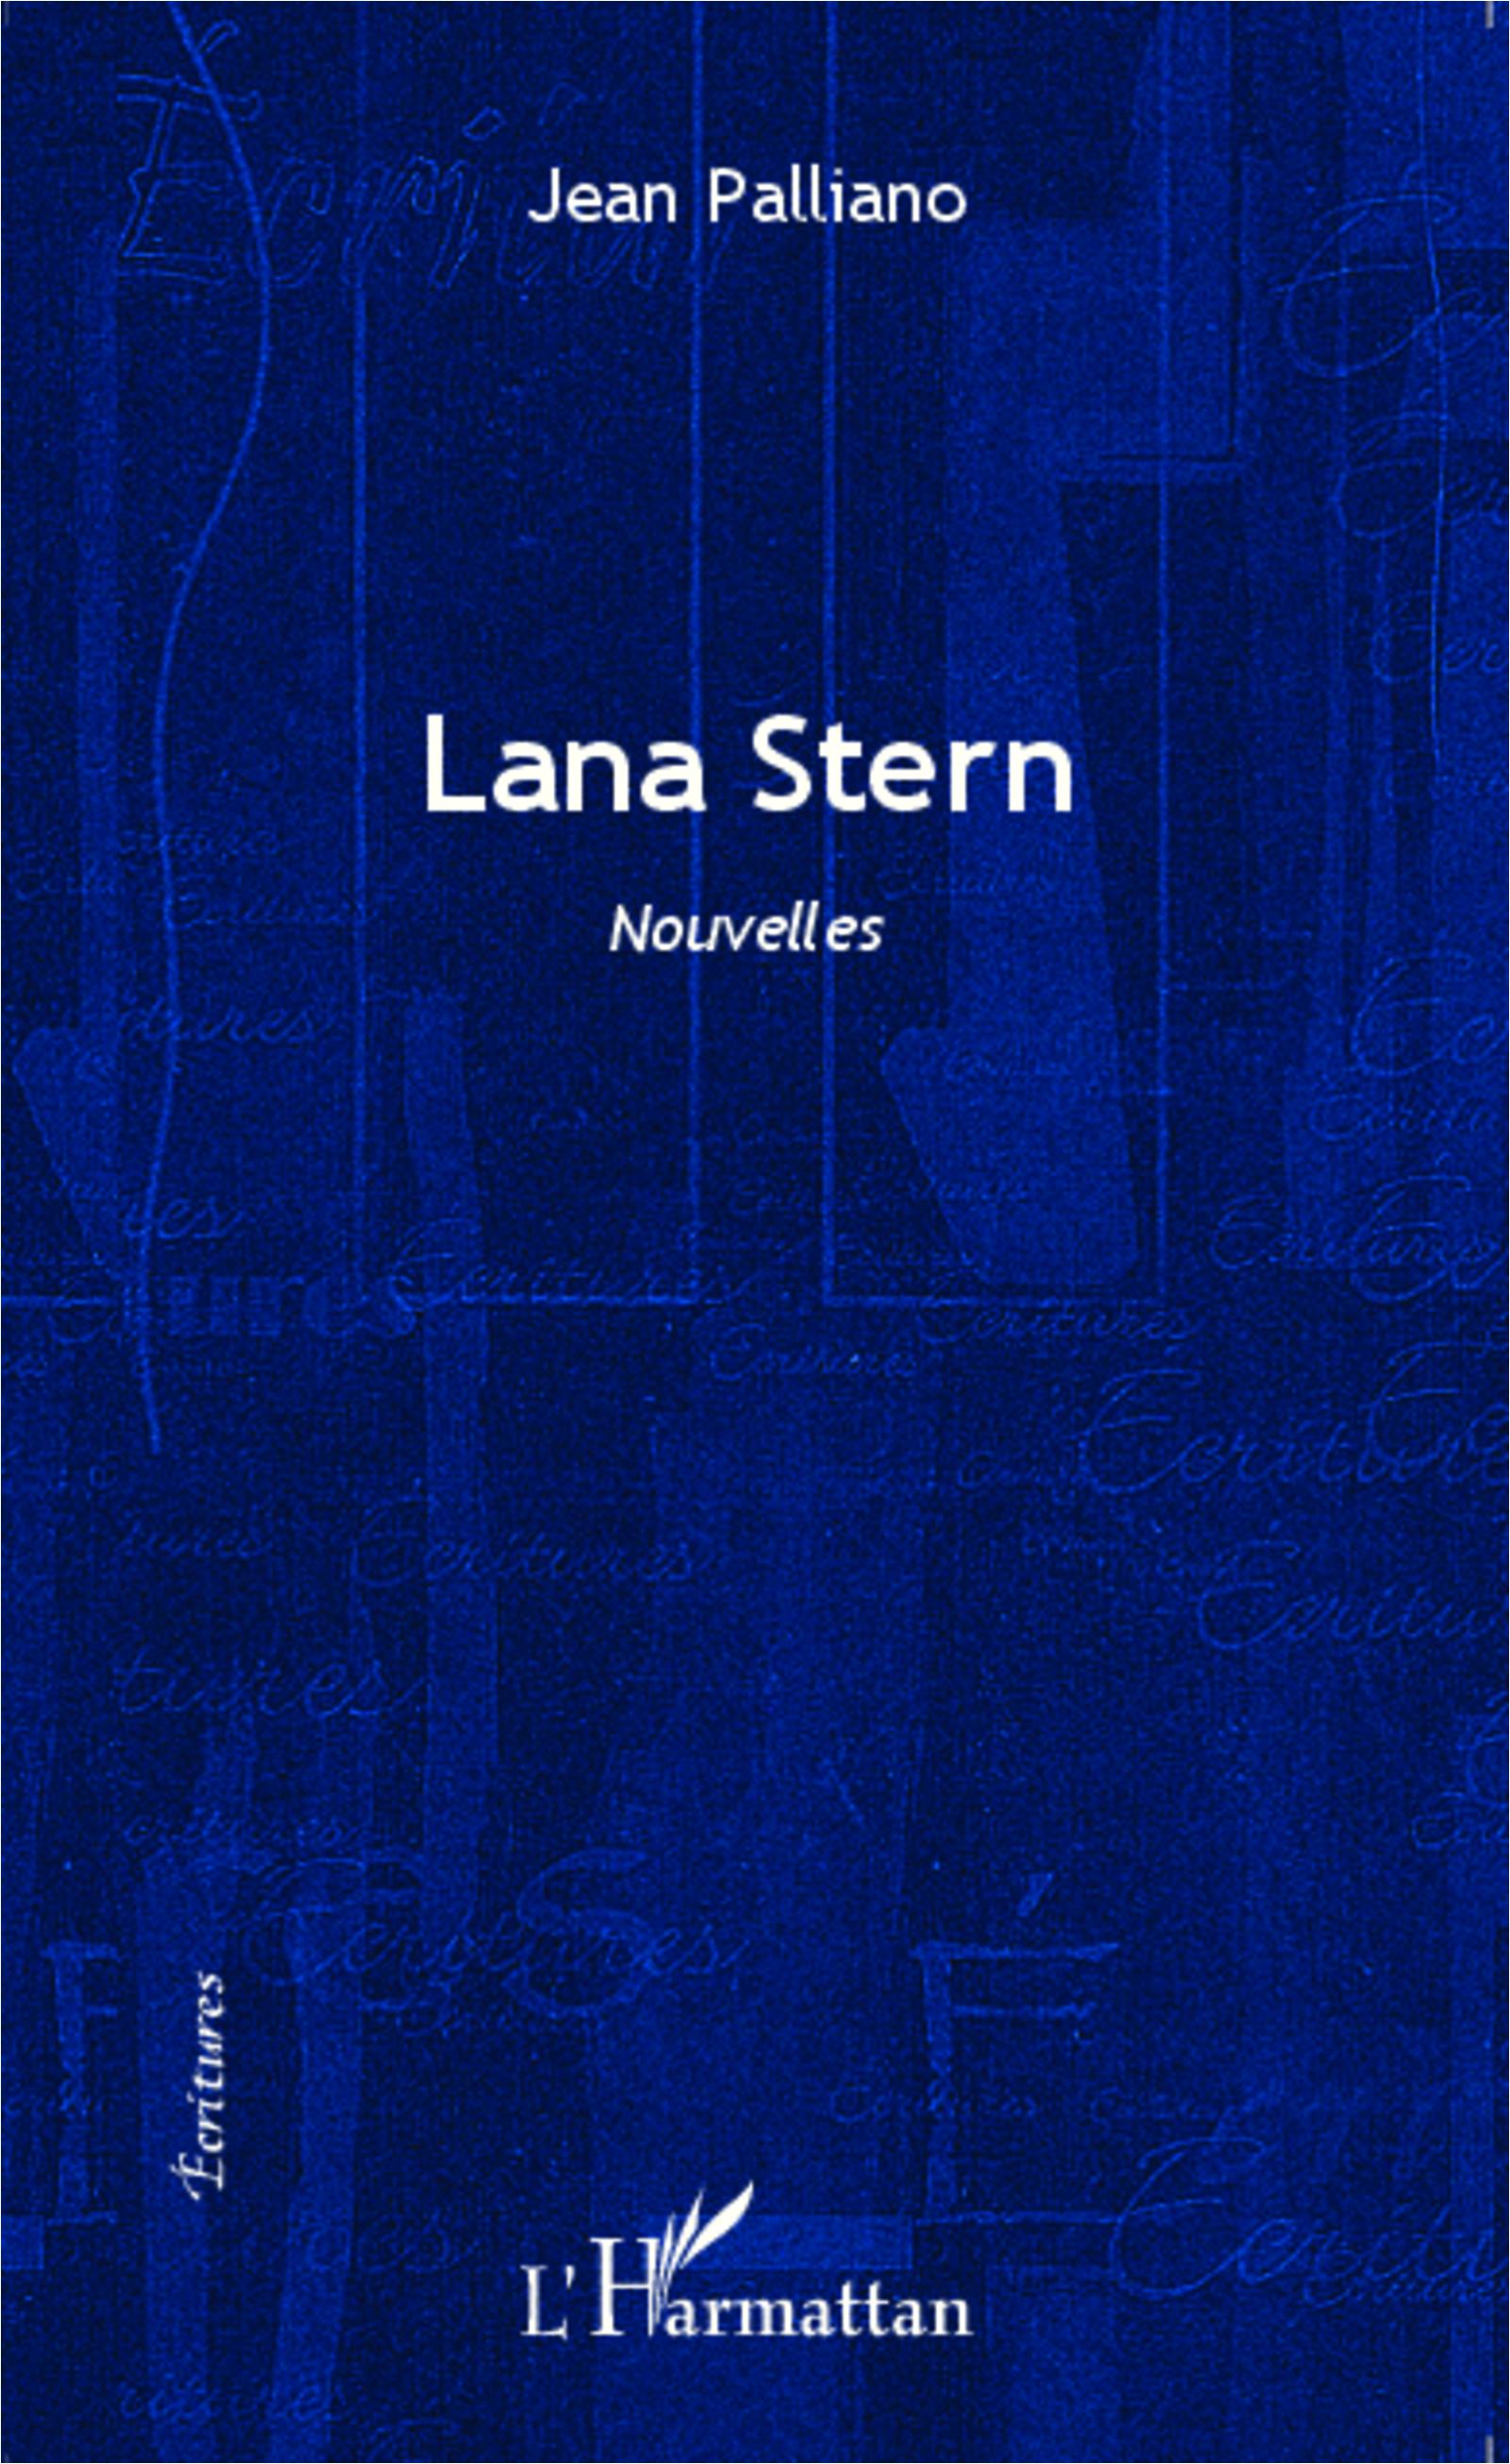 Lana Stern